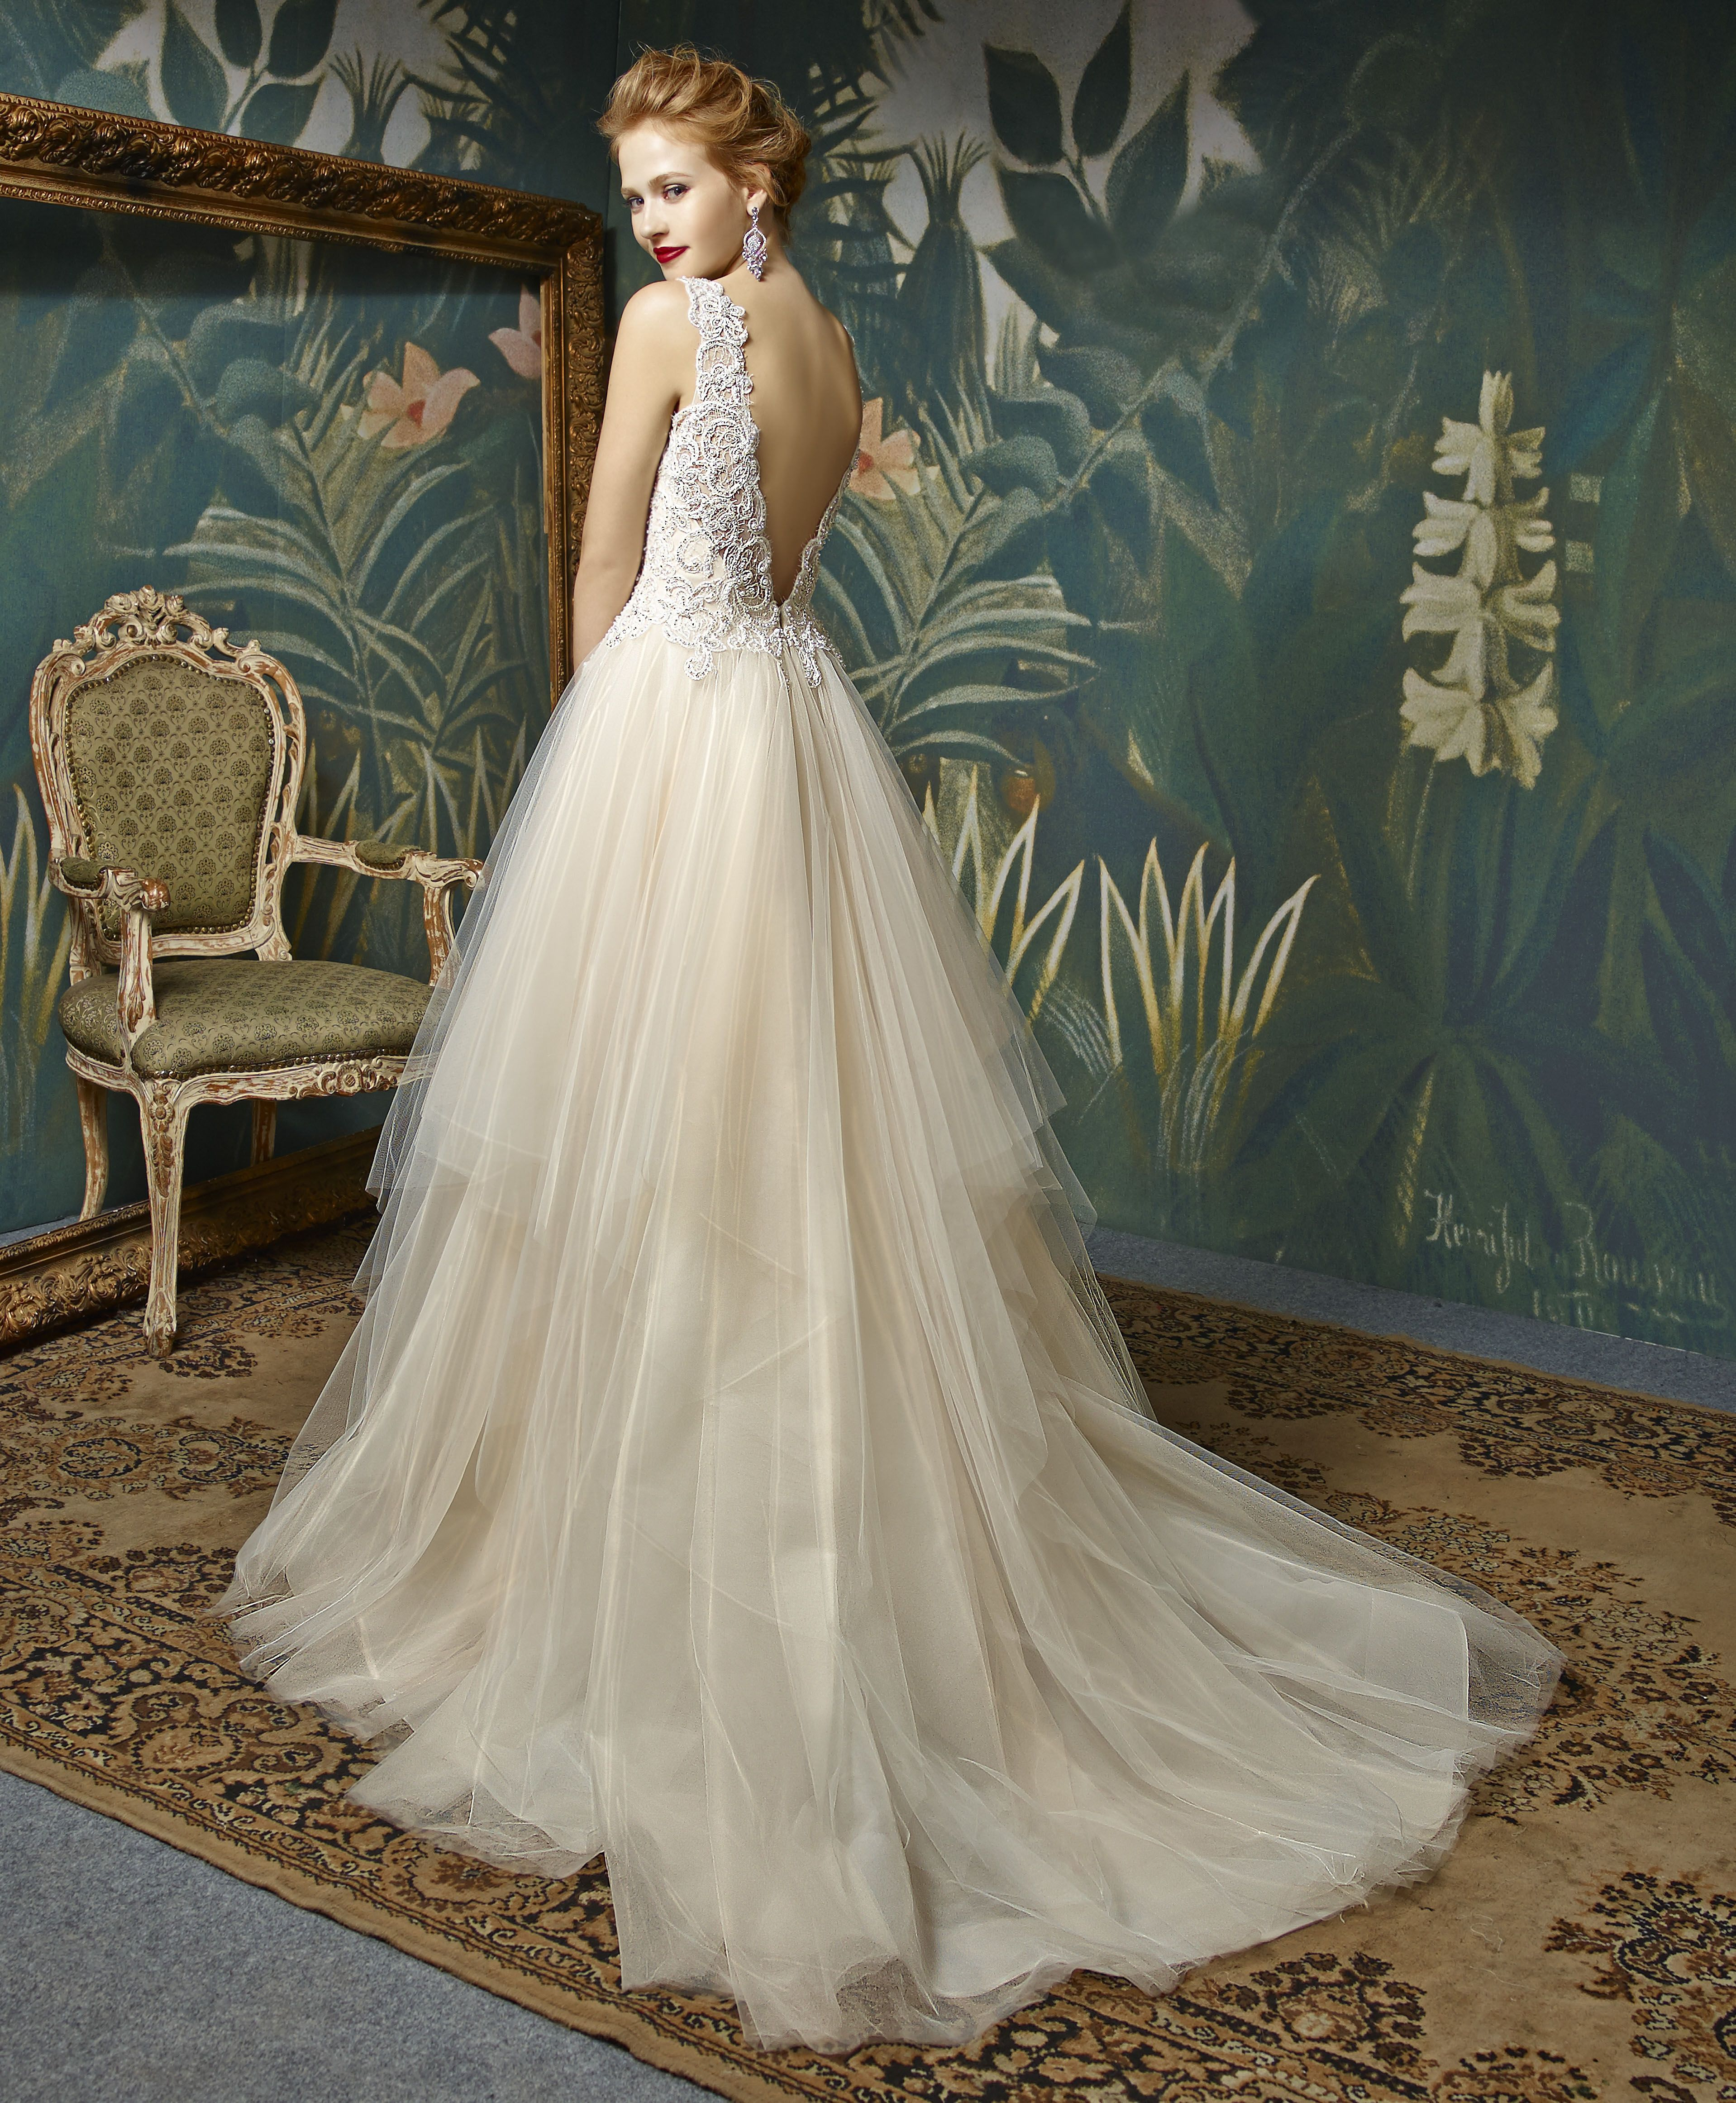 Enzoani wedding gown toronto bridal gown toronto wedding dress